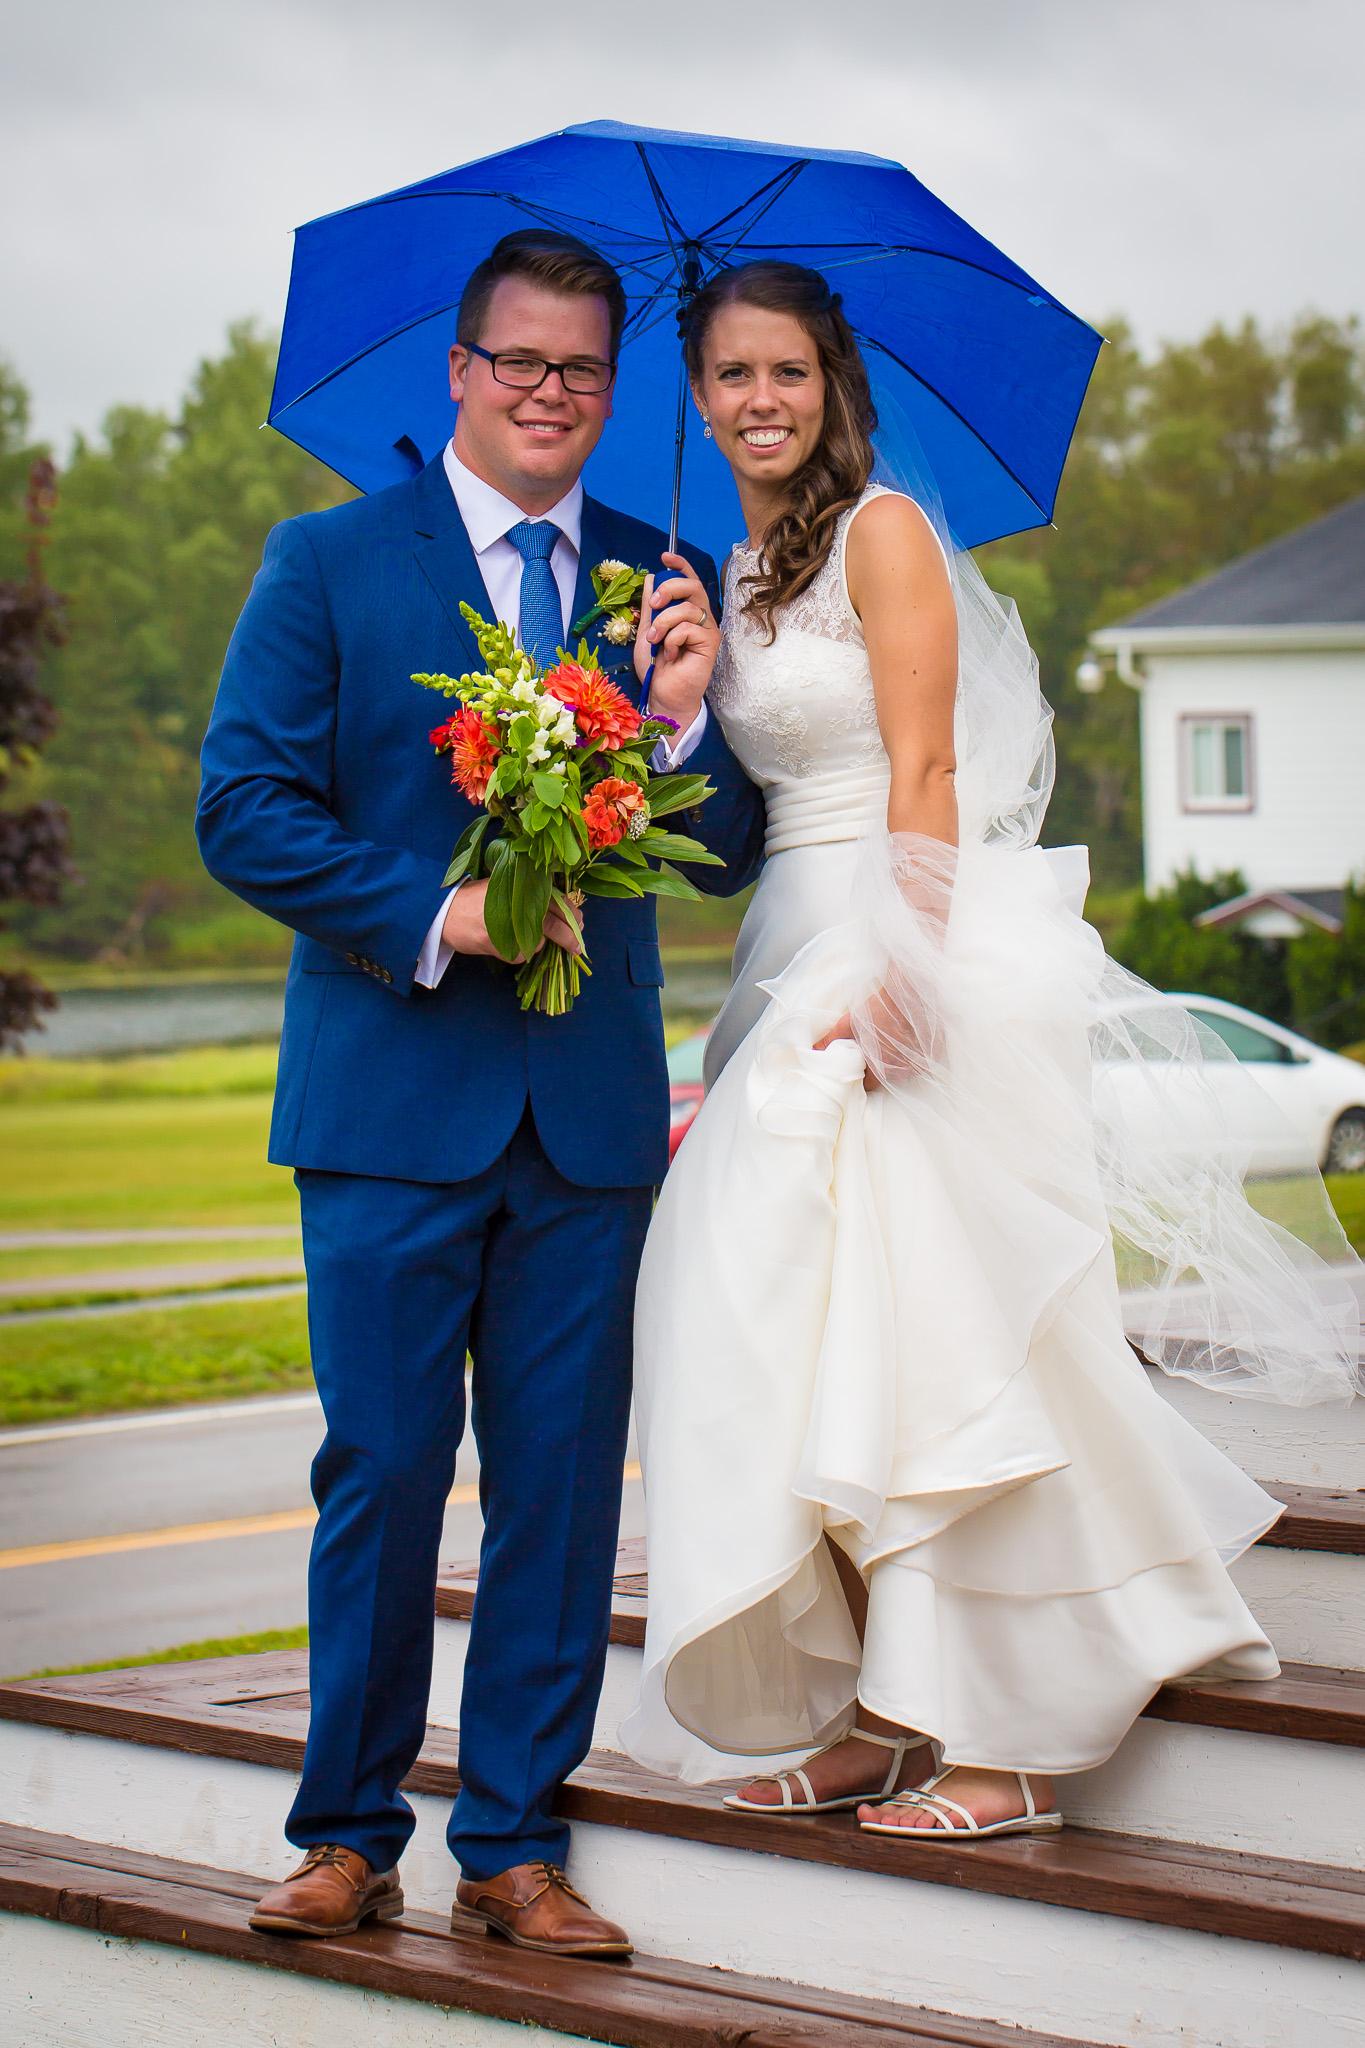 Wedding Photos in New Glasgow 3